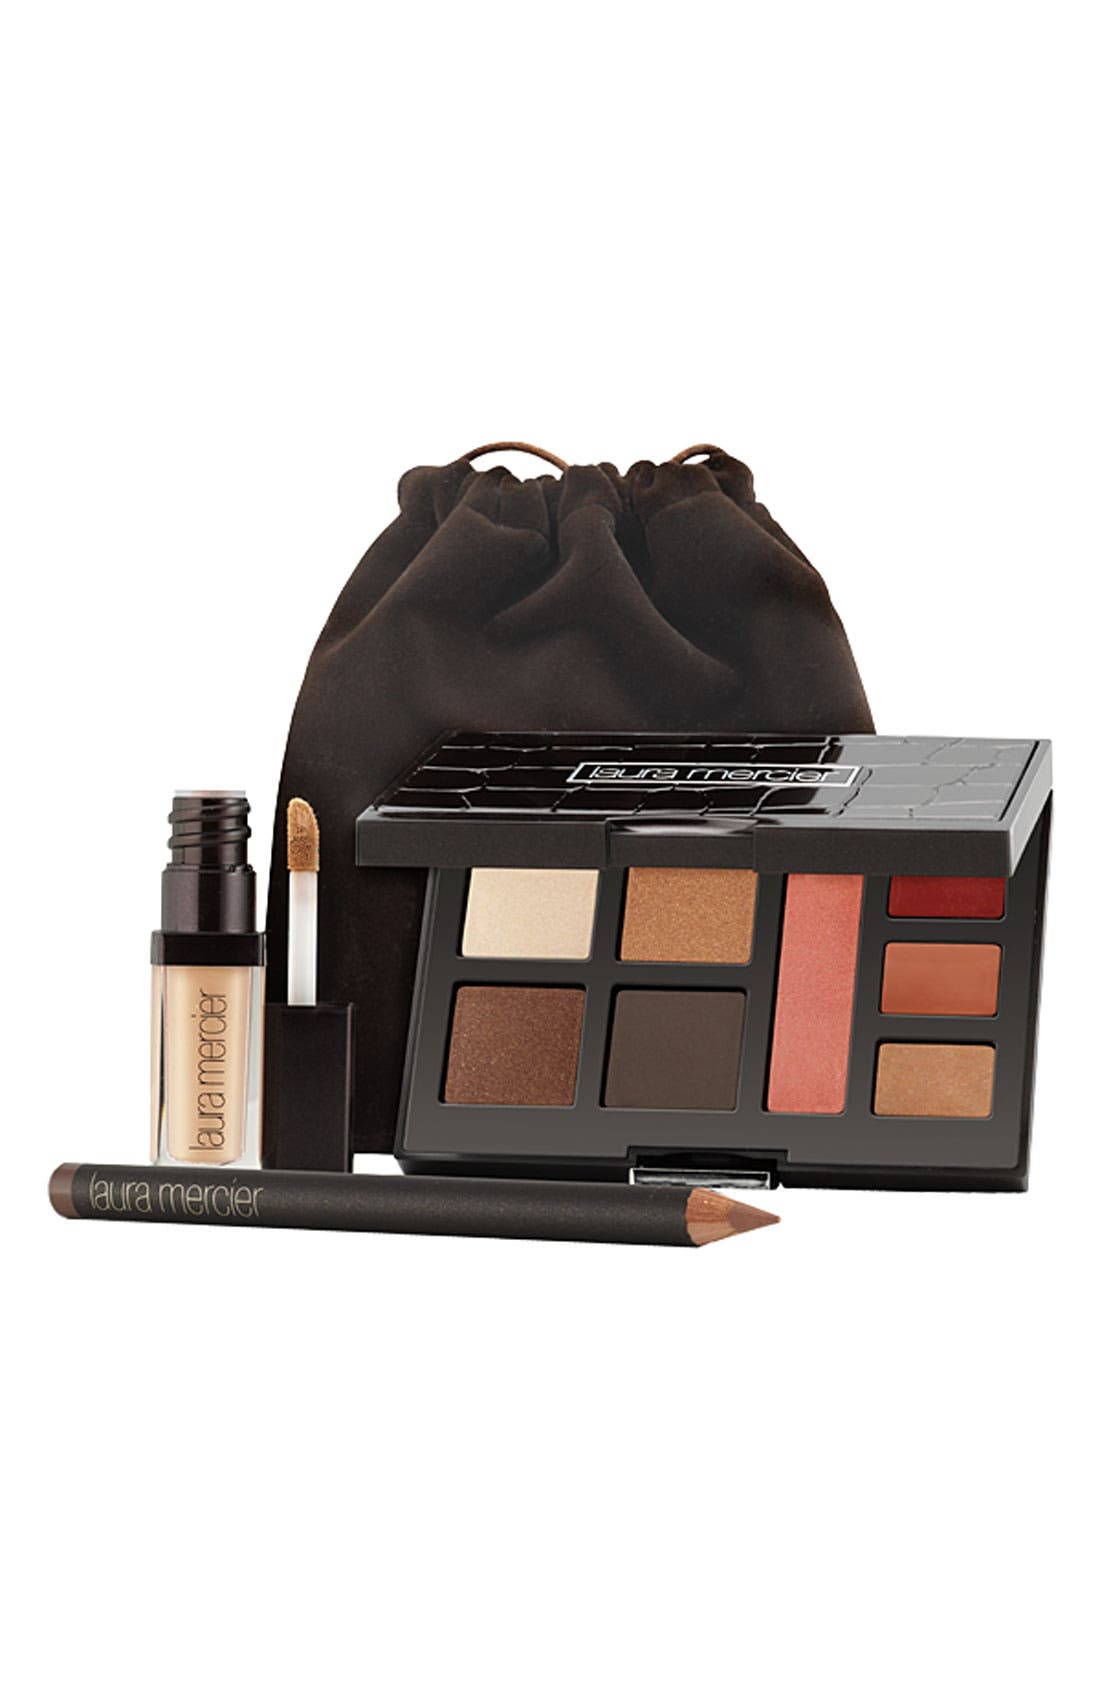 Alternate Image 1 Selected - Laura Mercier 'Color Essentials' Face Palette (Nordstrom Exclusive) ($115 Value)